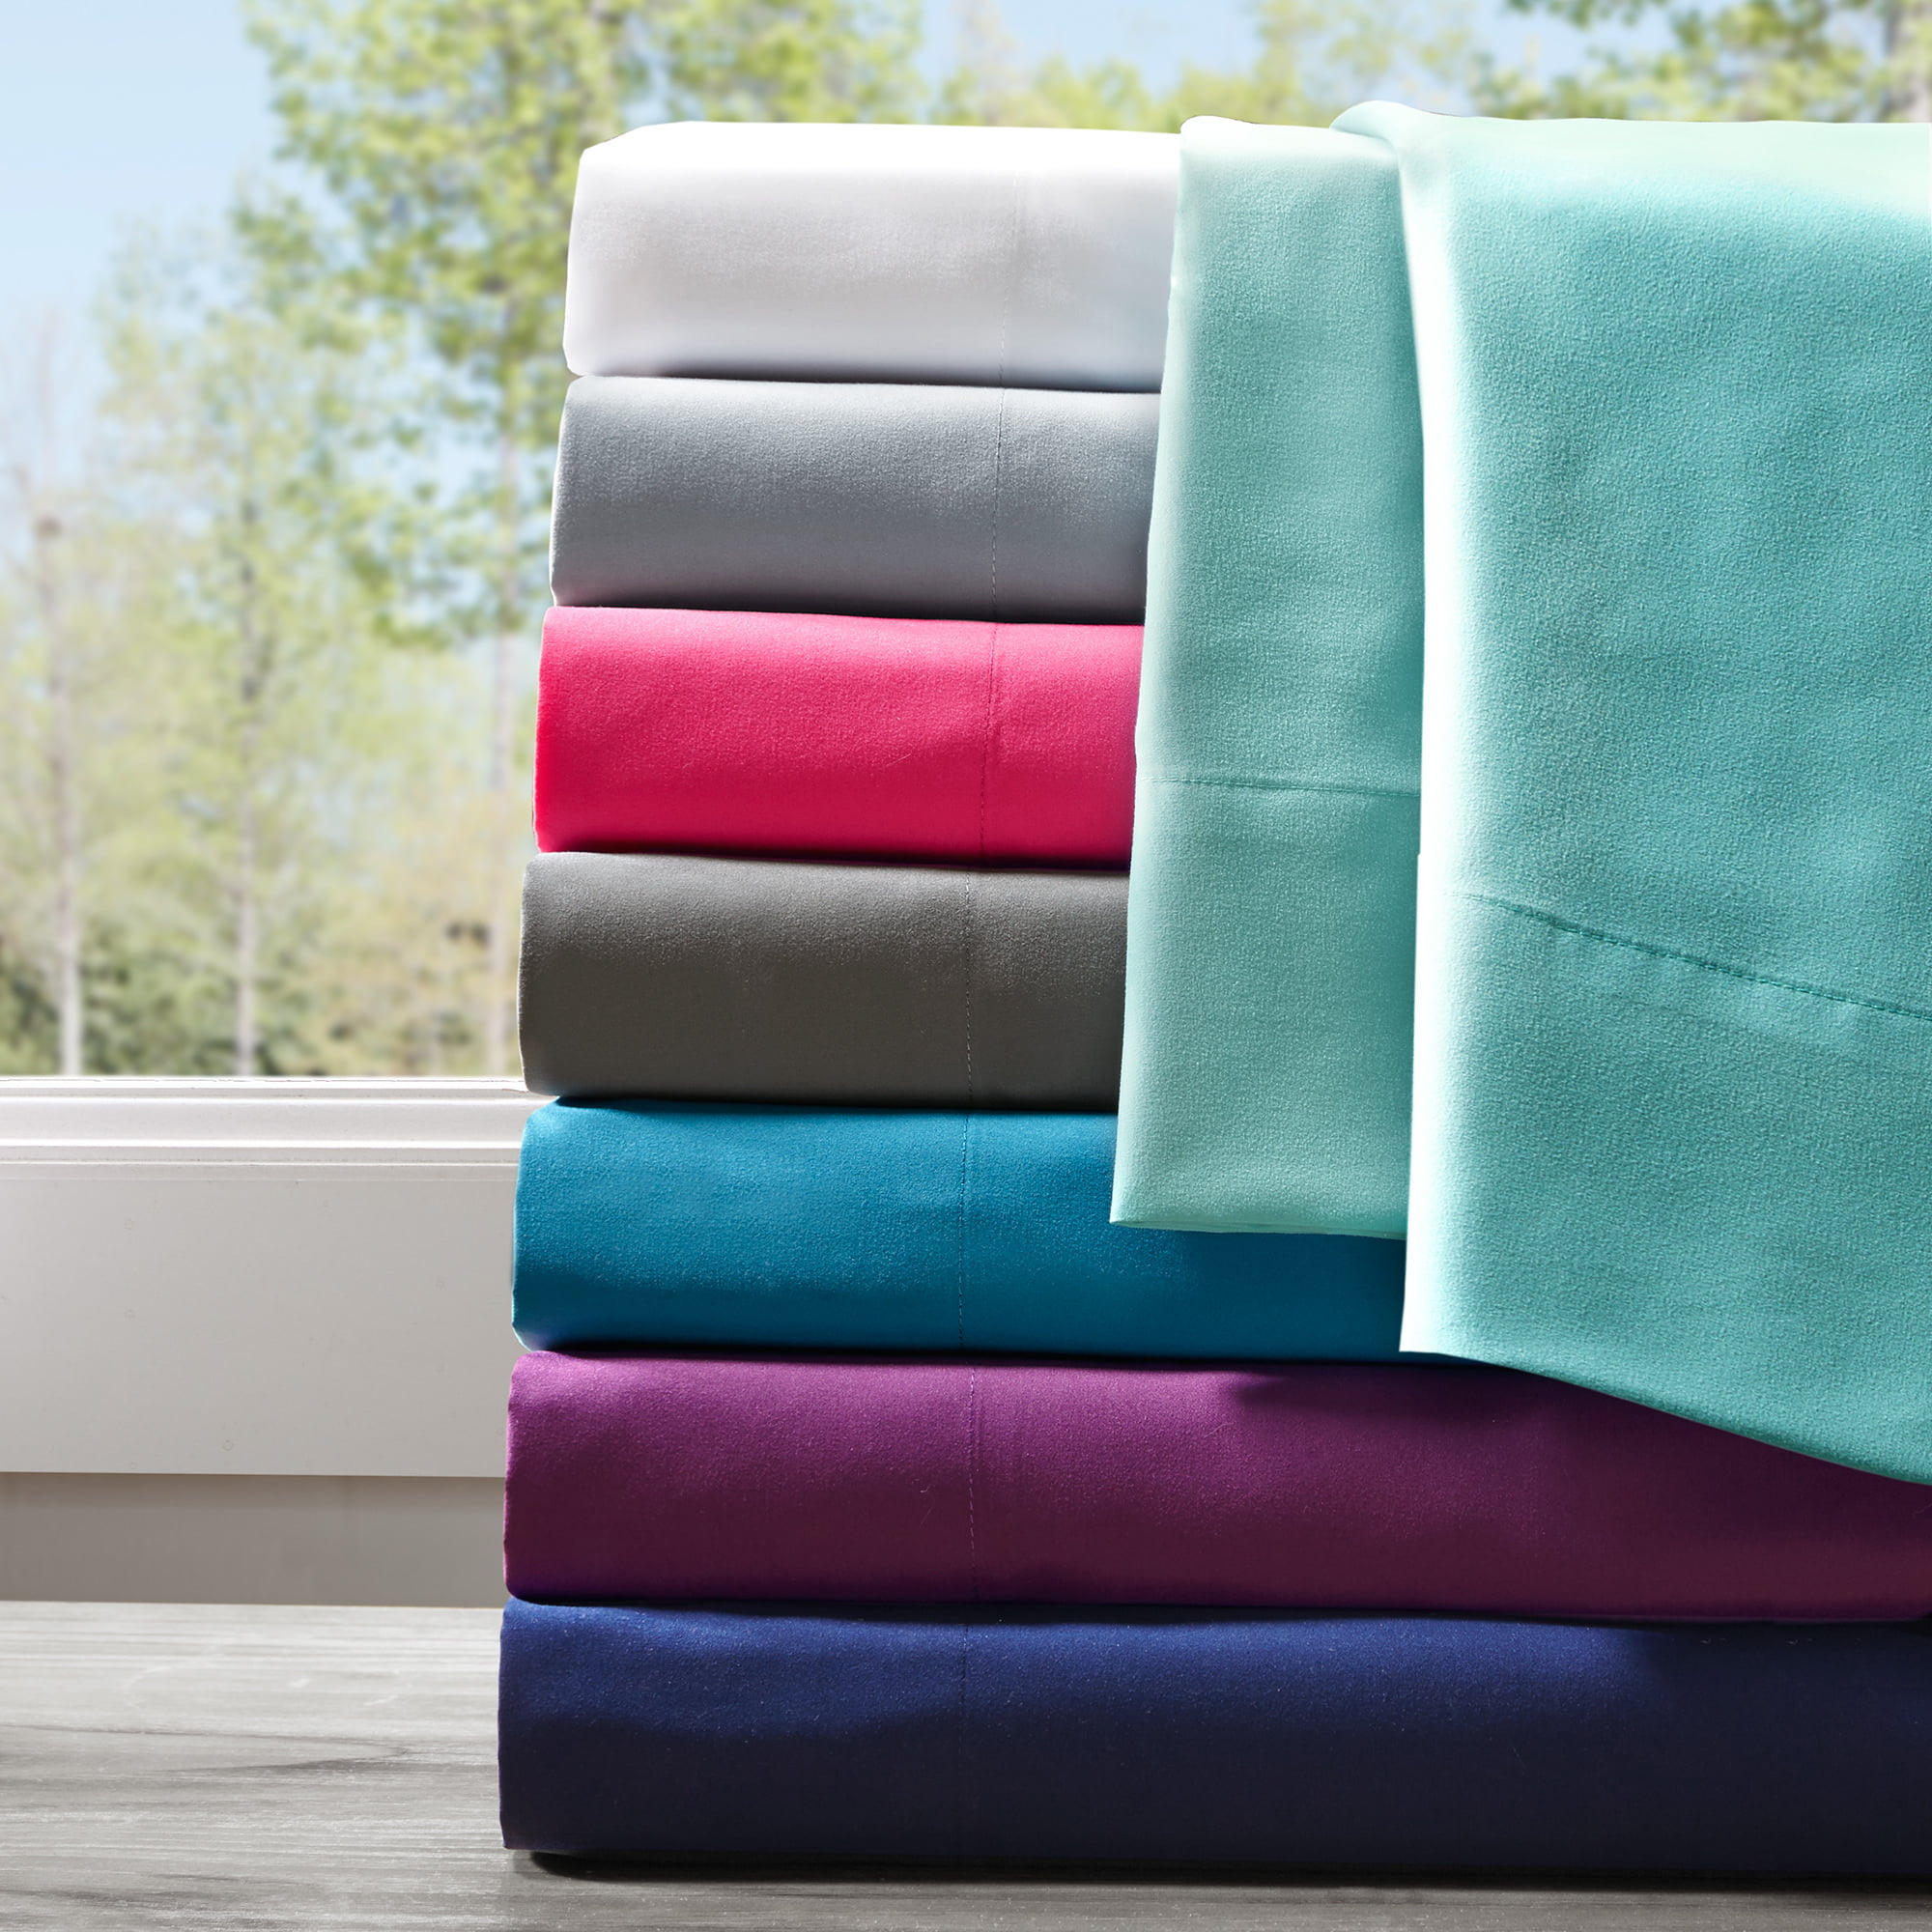 Twin Microfiber All Season Wrinkle-Free Sheet Set Pink